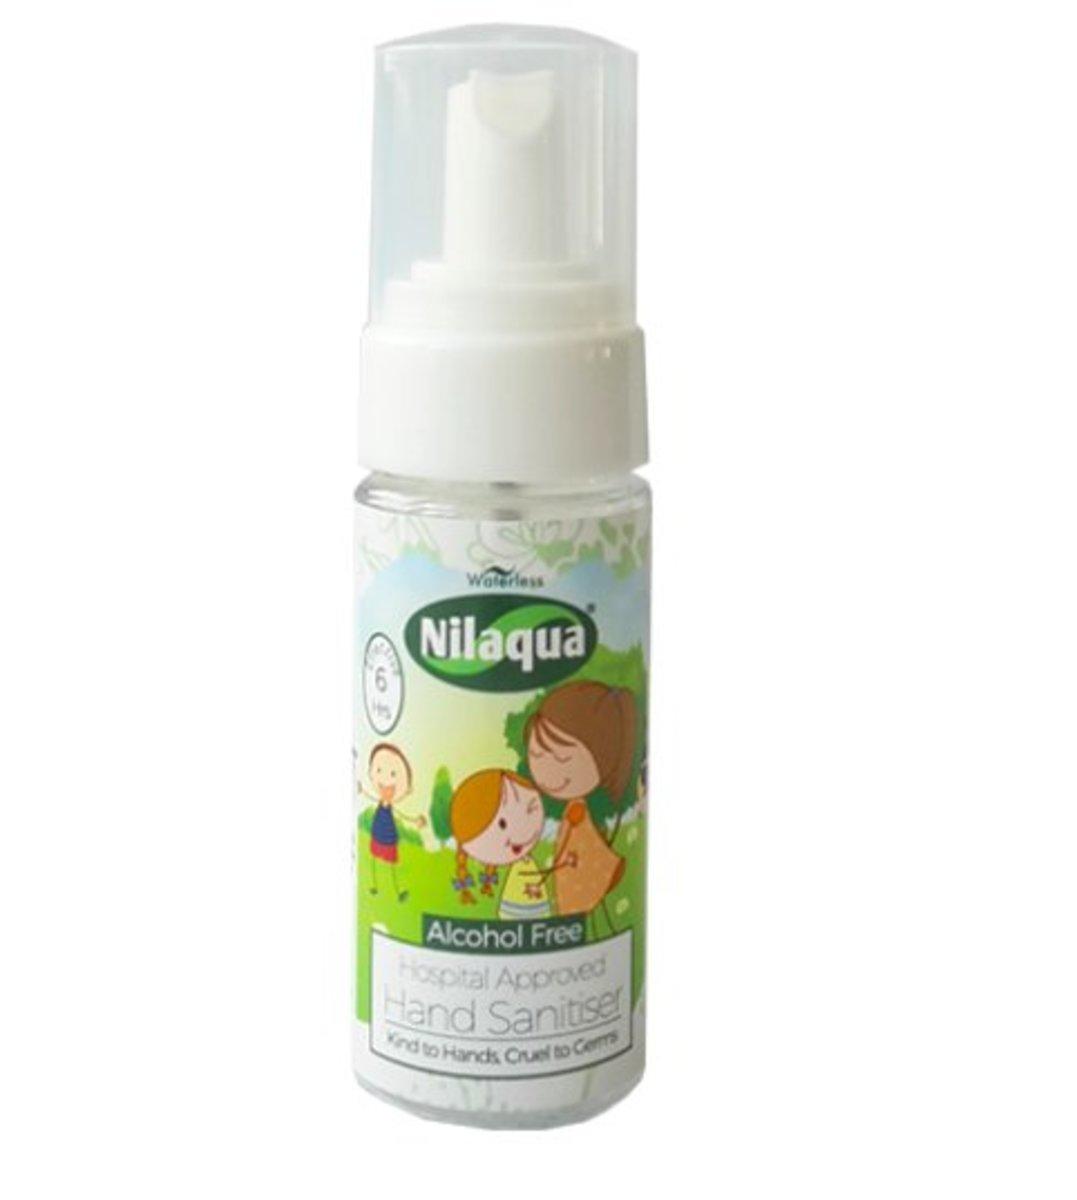 Little Hand Alcohol Free Hand Sanitiser spray 55ml (NHS UK Approved)